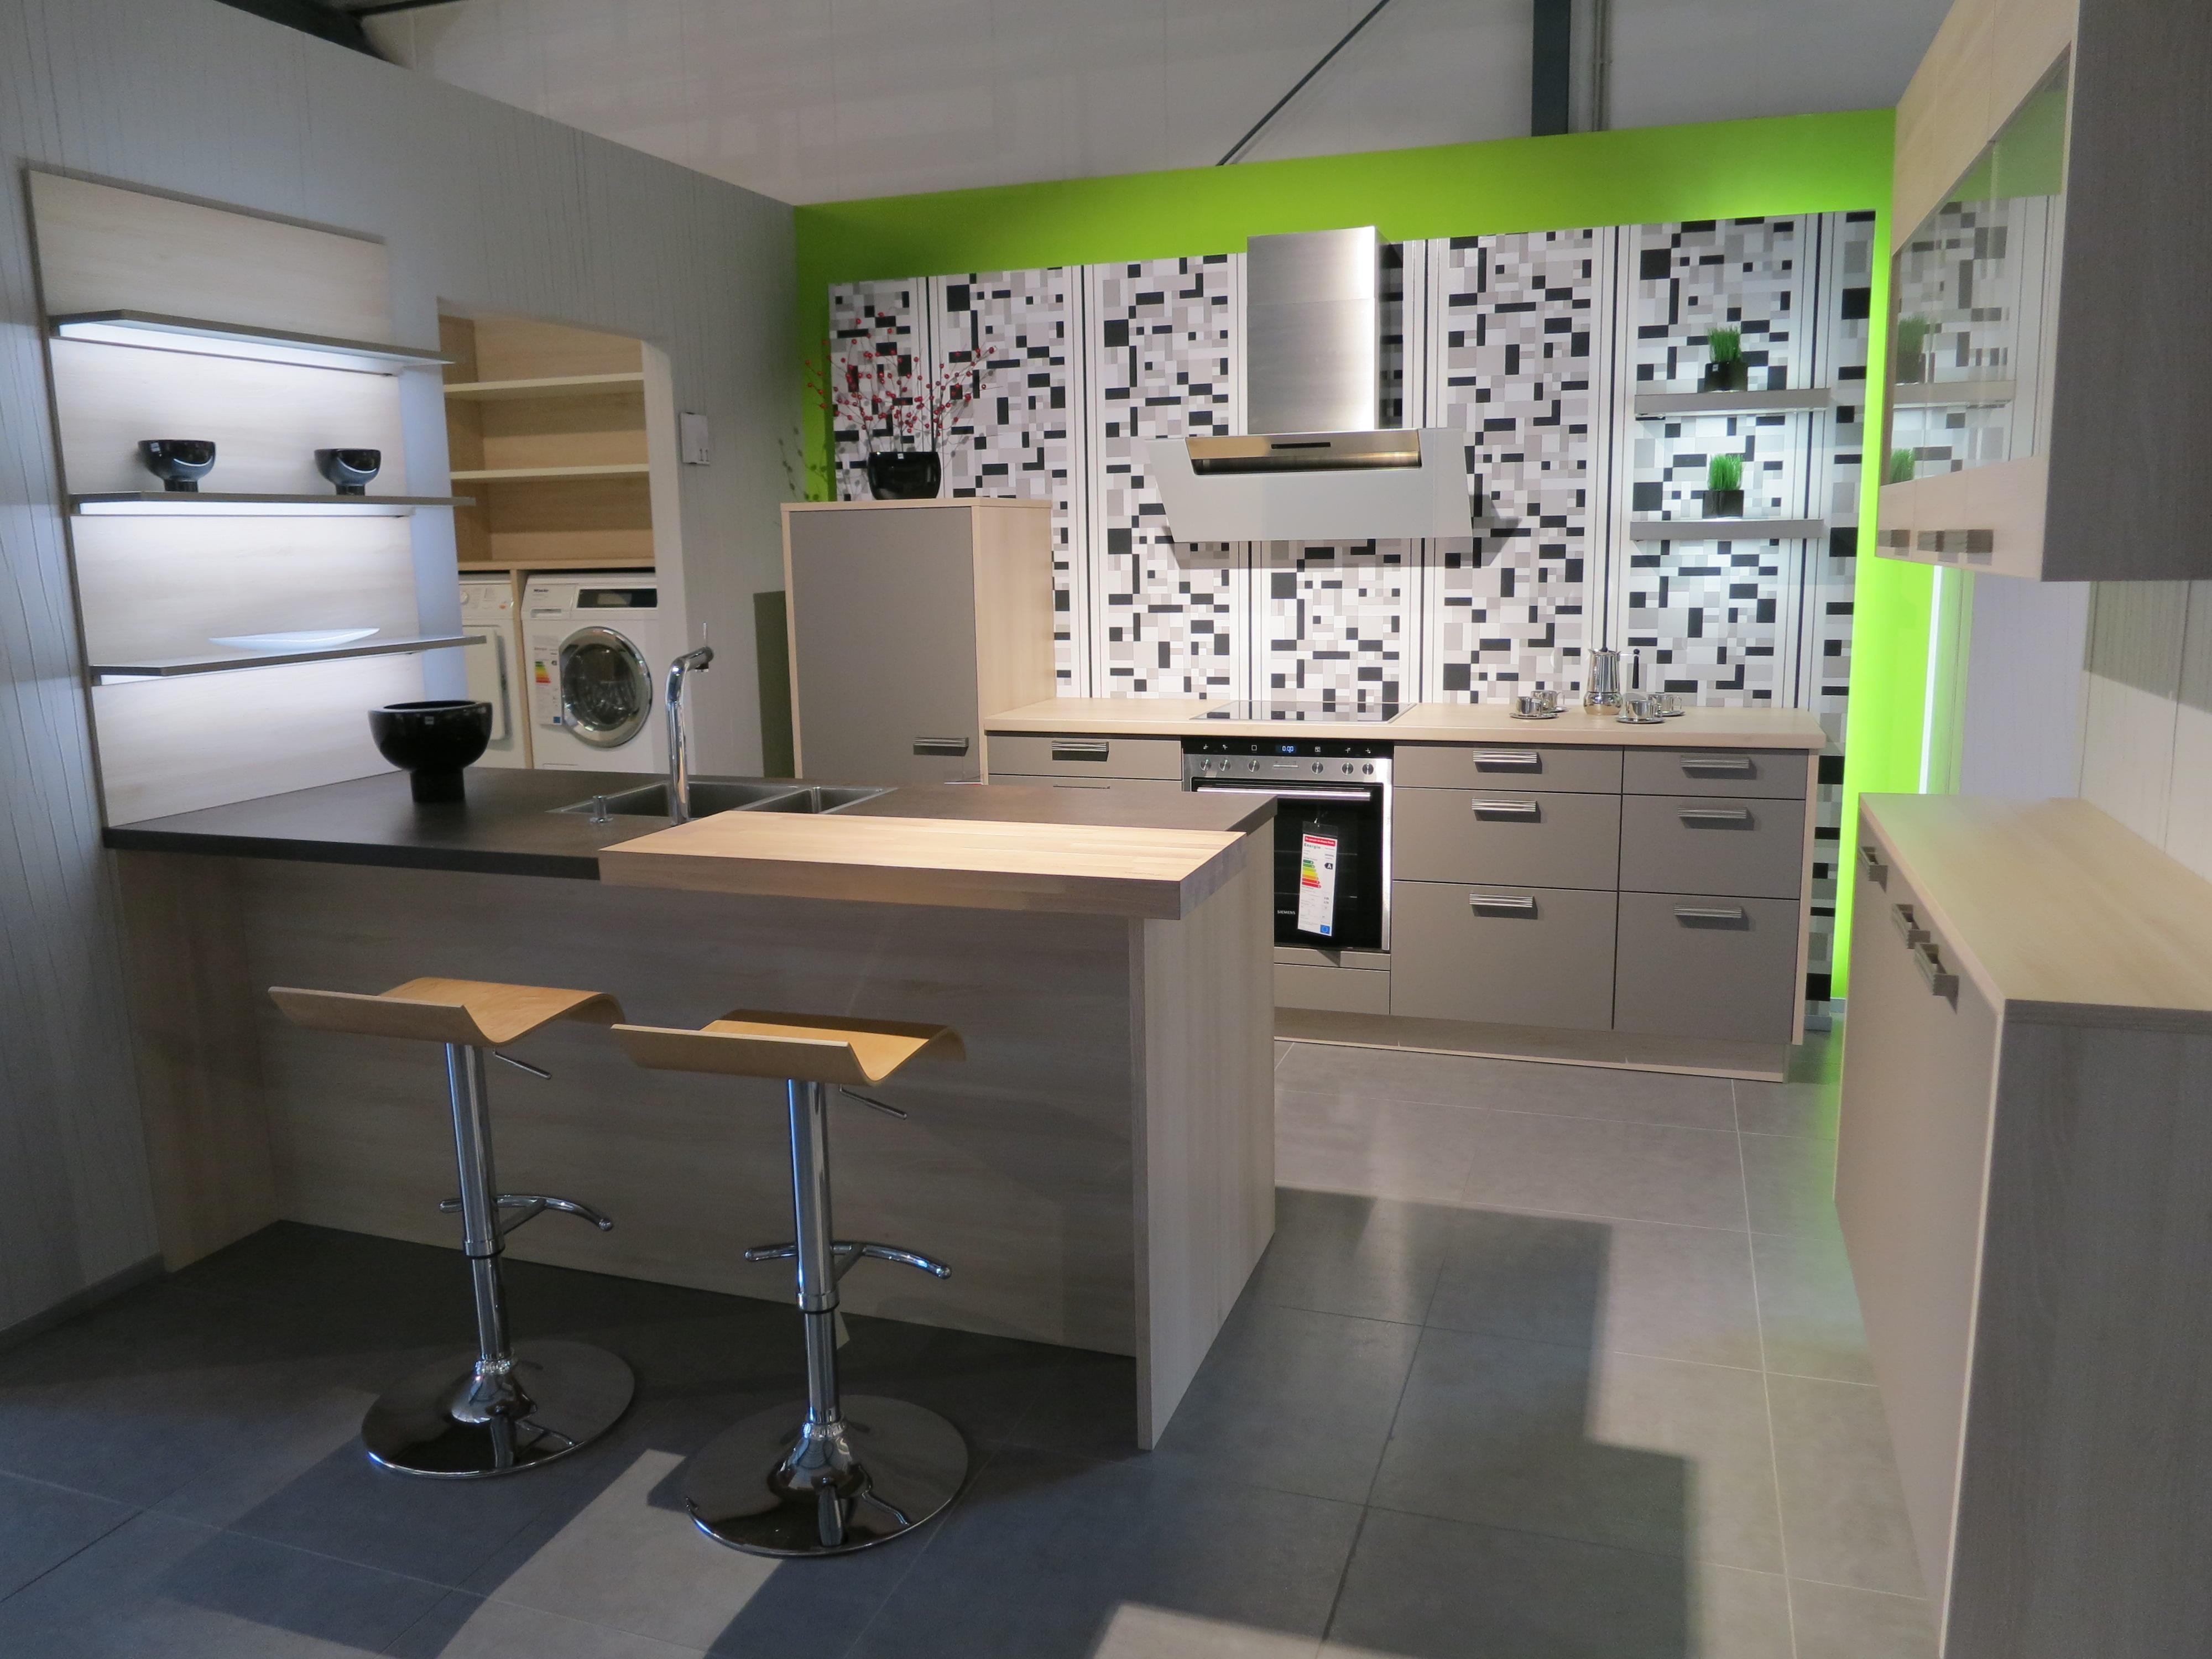 Küchen Forum Onlineshop - Ausstellungsküche AV 1080 basalt